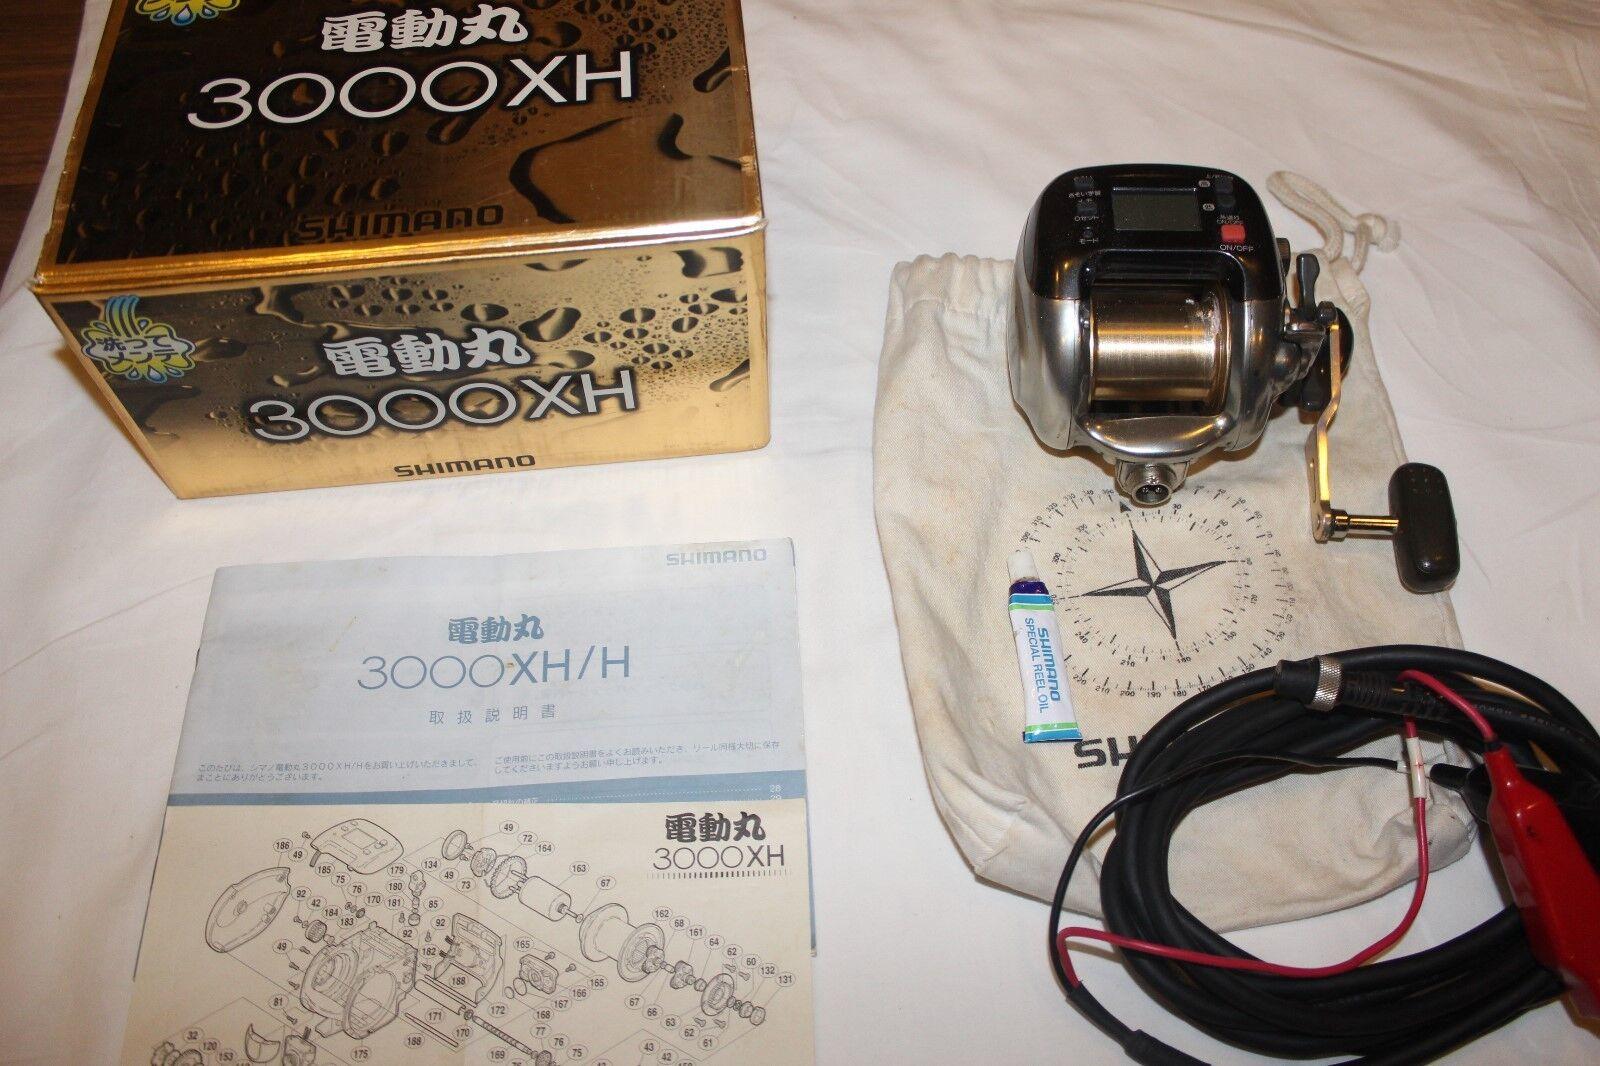 SHIMANO DENDOU-MARU 3000 XH-ELEKTROROLLE-MADE IN JAPAN-Nr 636